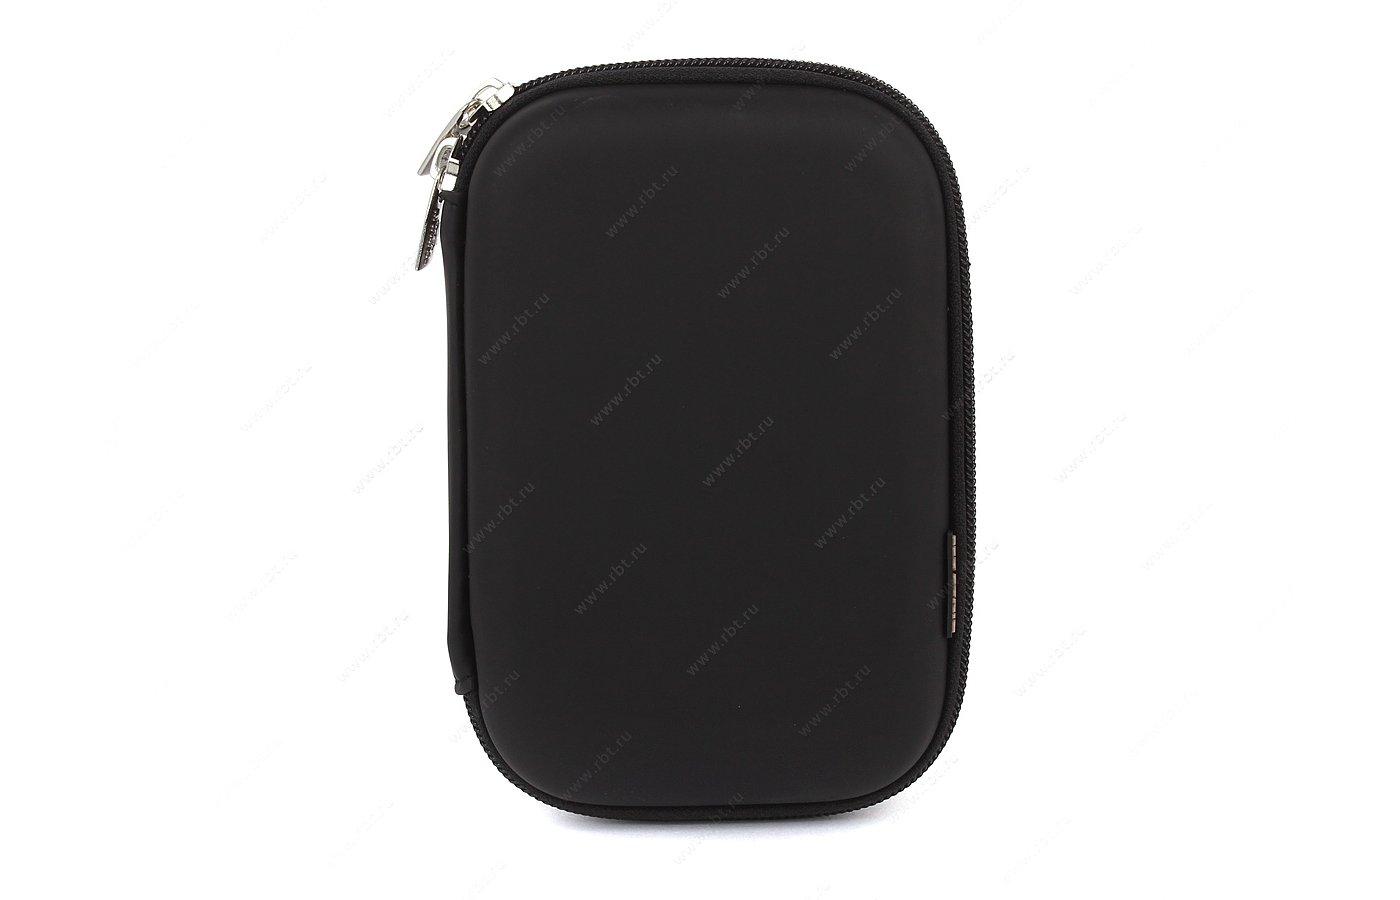 Кейс для жесткого диска Riva Case 9101 black чехол для HDD